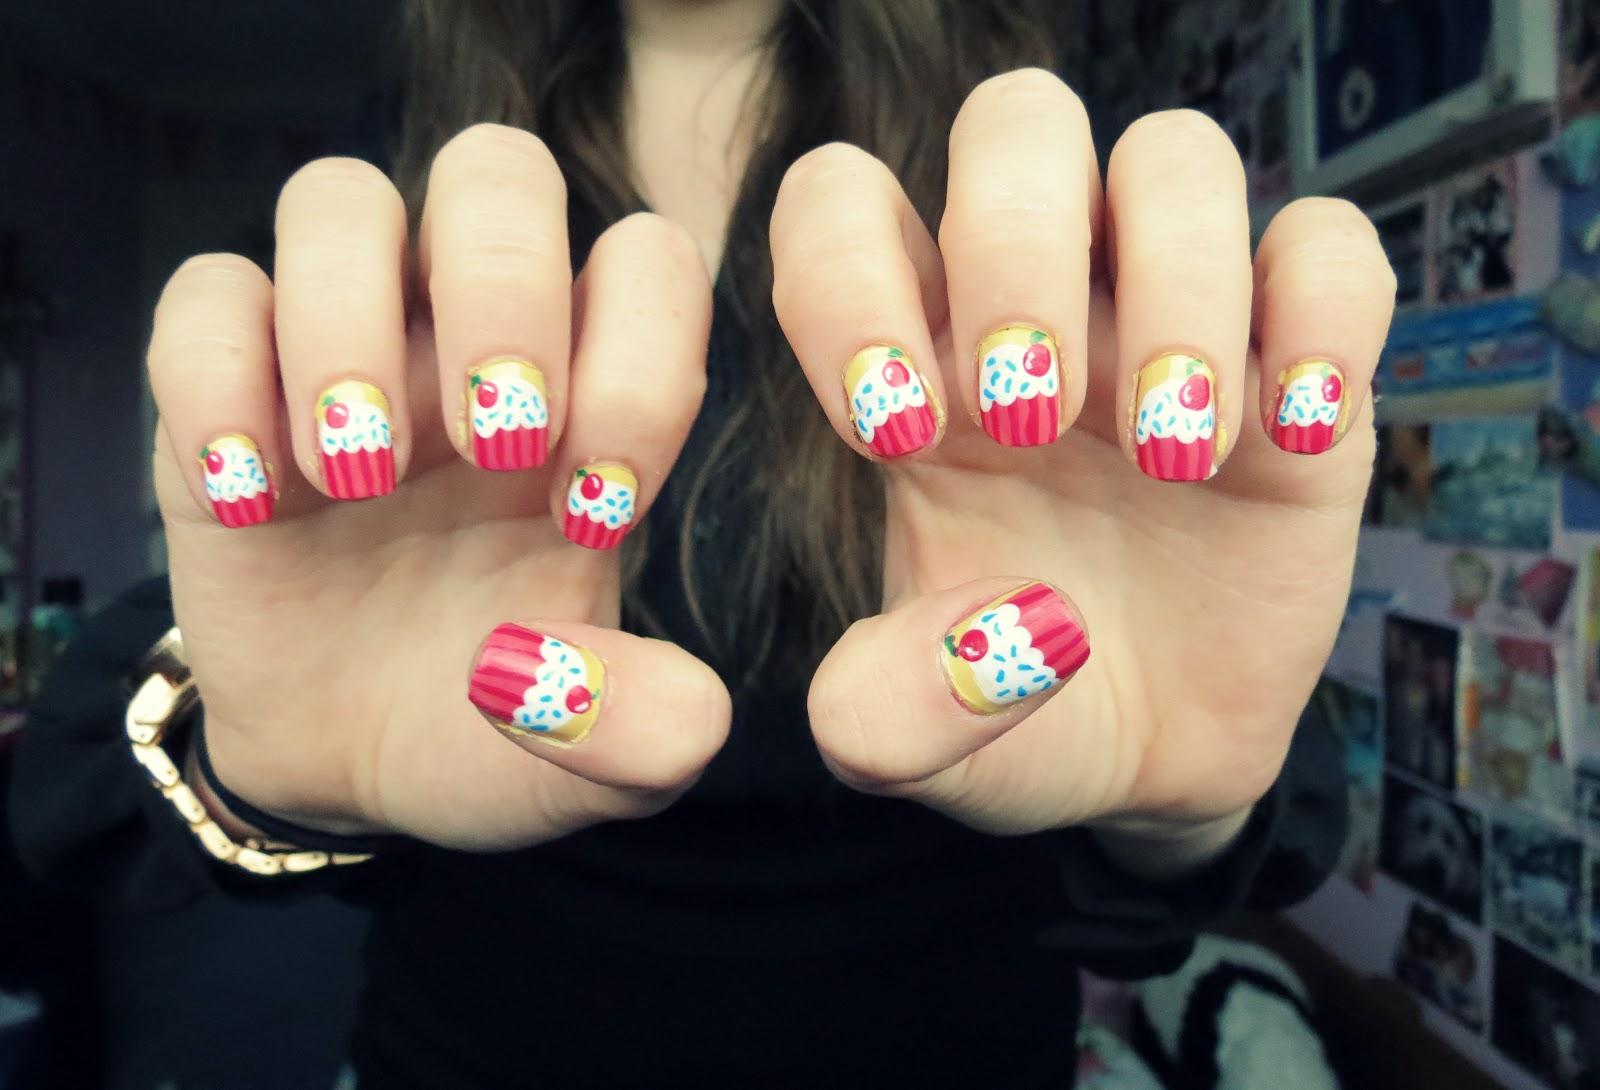 Cupcakes nails monday november 21 2016 prinsesfo Gallery